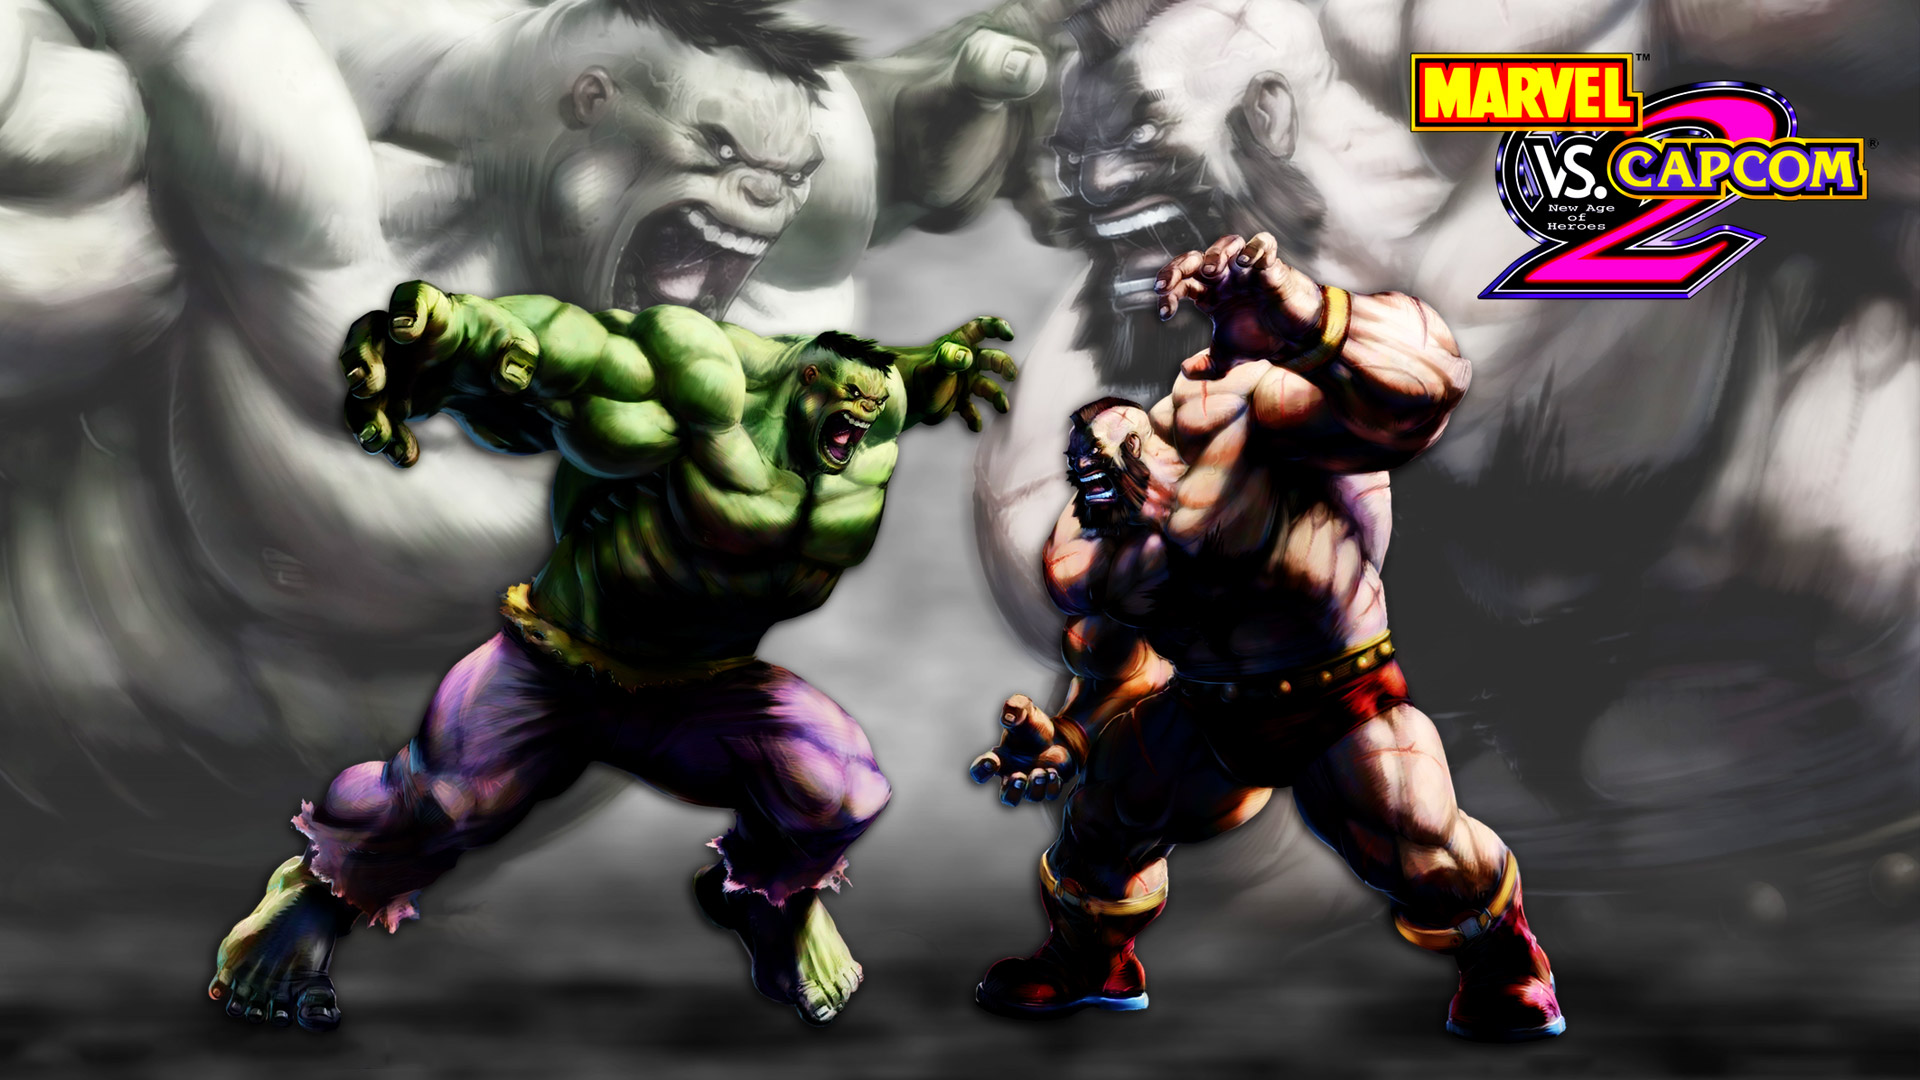 Free Marvel vs. Capcom 2: New Age of Heroes Wallpaper in 1920x1080